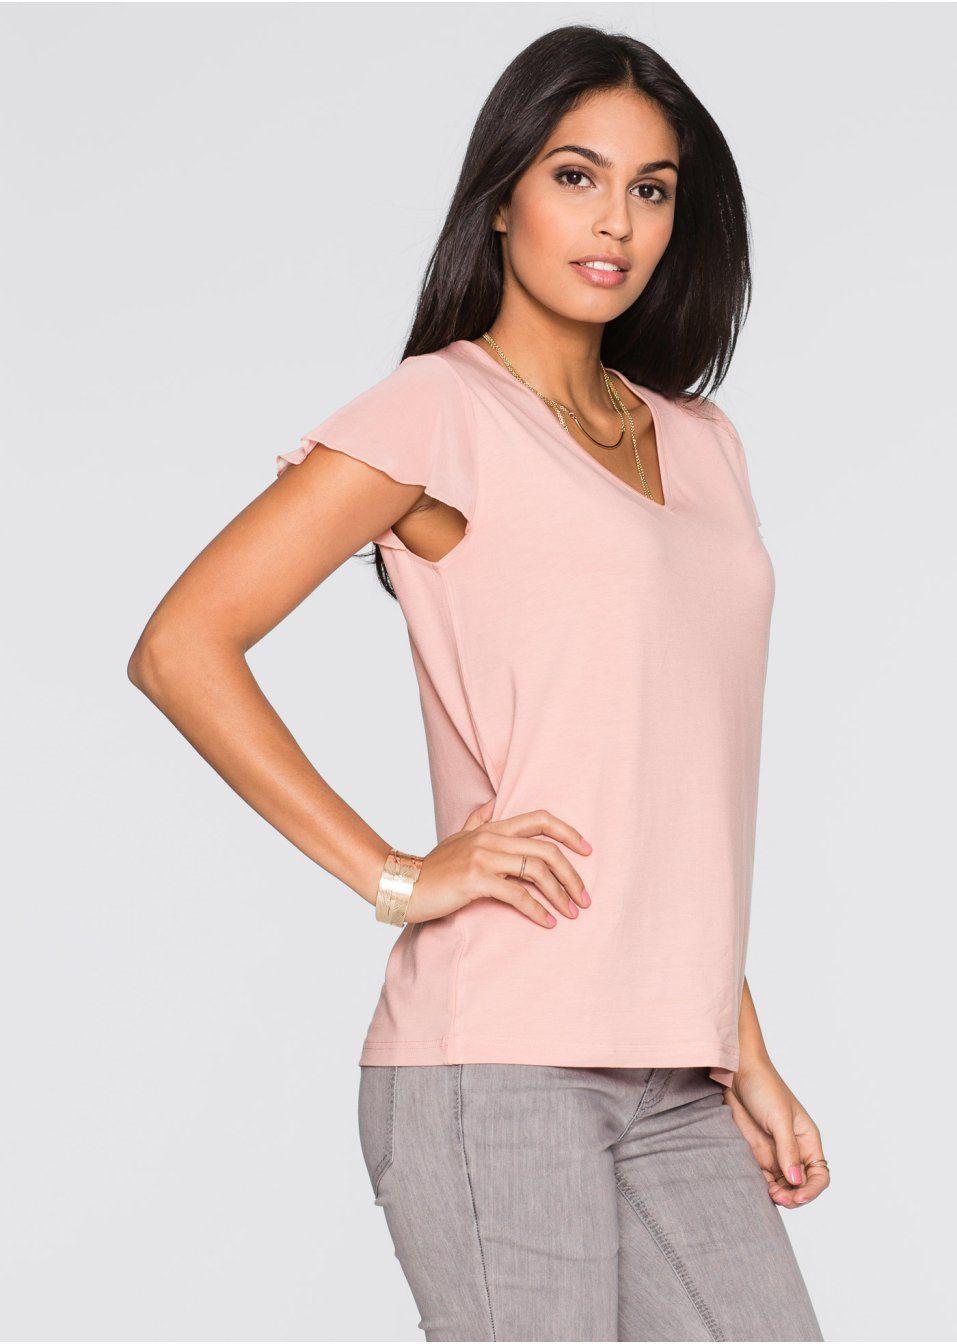 Shirt Z Krotkimi Rekawem Open Shoulder Tops Fashion Women S Top